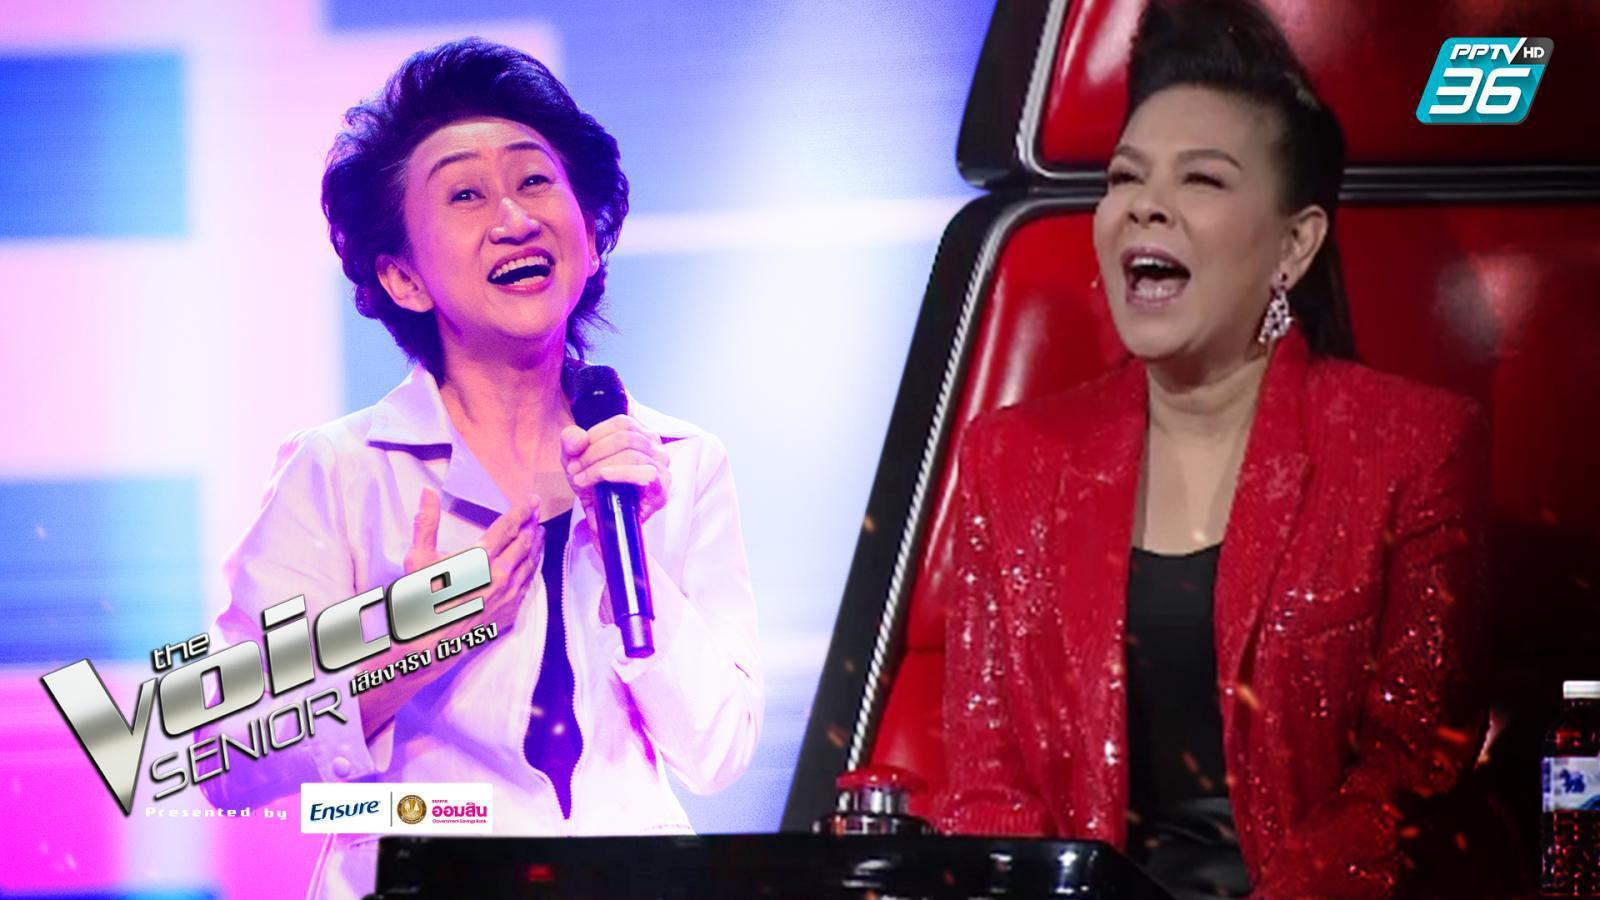 The Voice Senior Thailand 2020 EP.4 | ดารารุ่นใหญ่ 63 ยังแจ๋ว ฟิตเฟิร์ม แดนซ์กระจาย